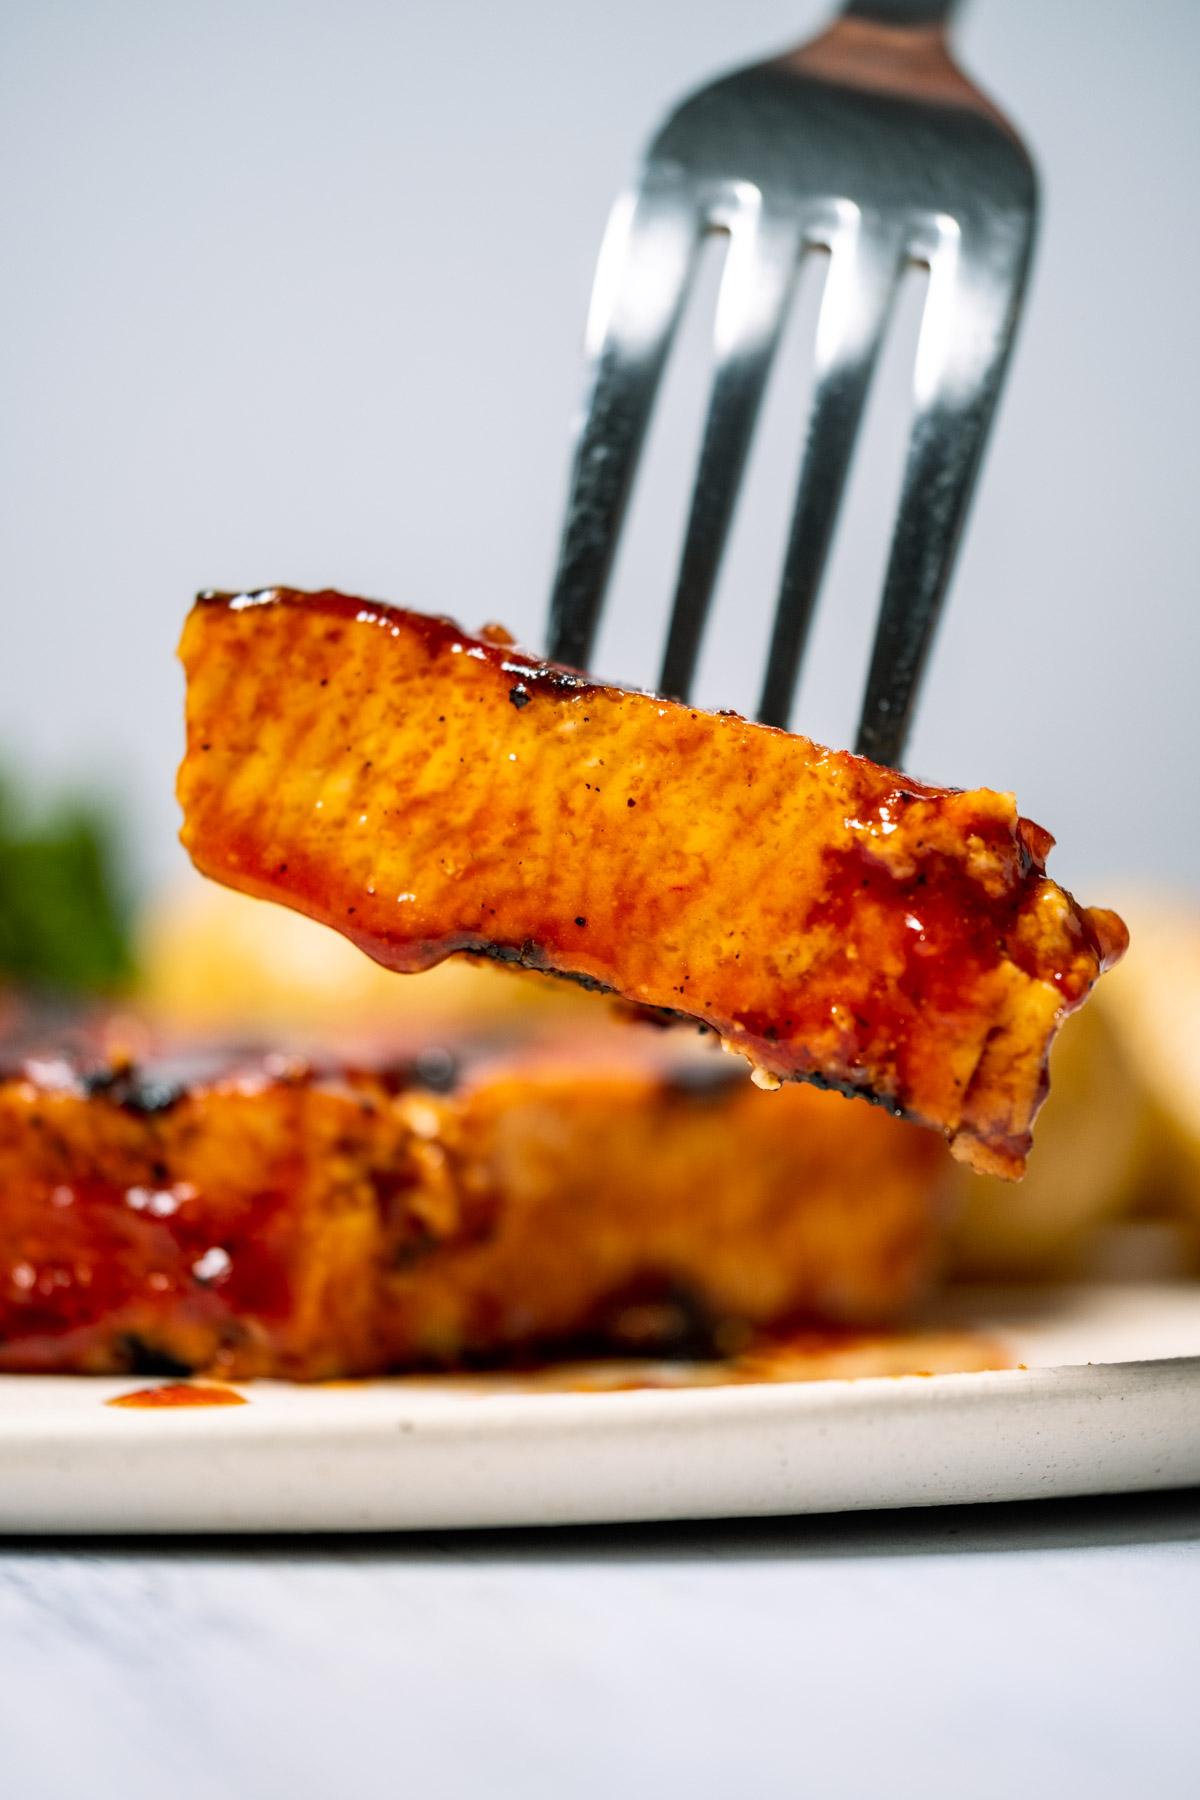 Forkful of tofu steak.